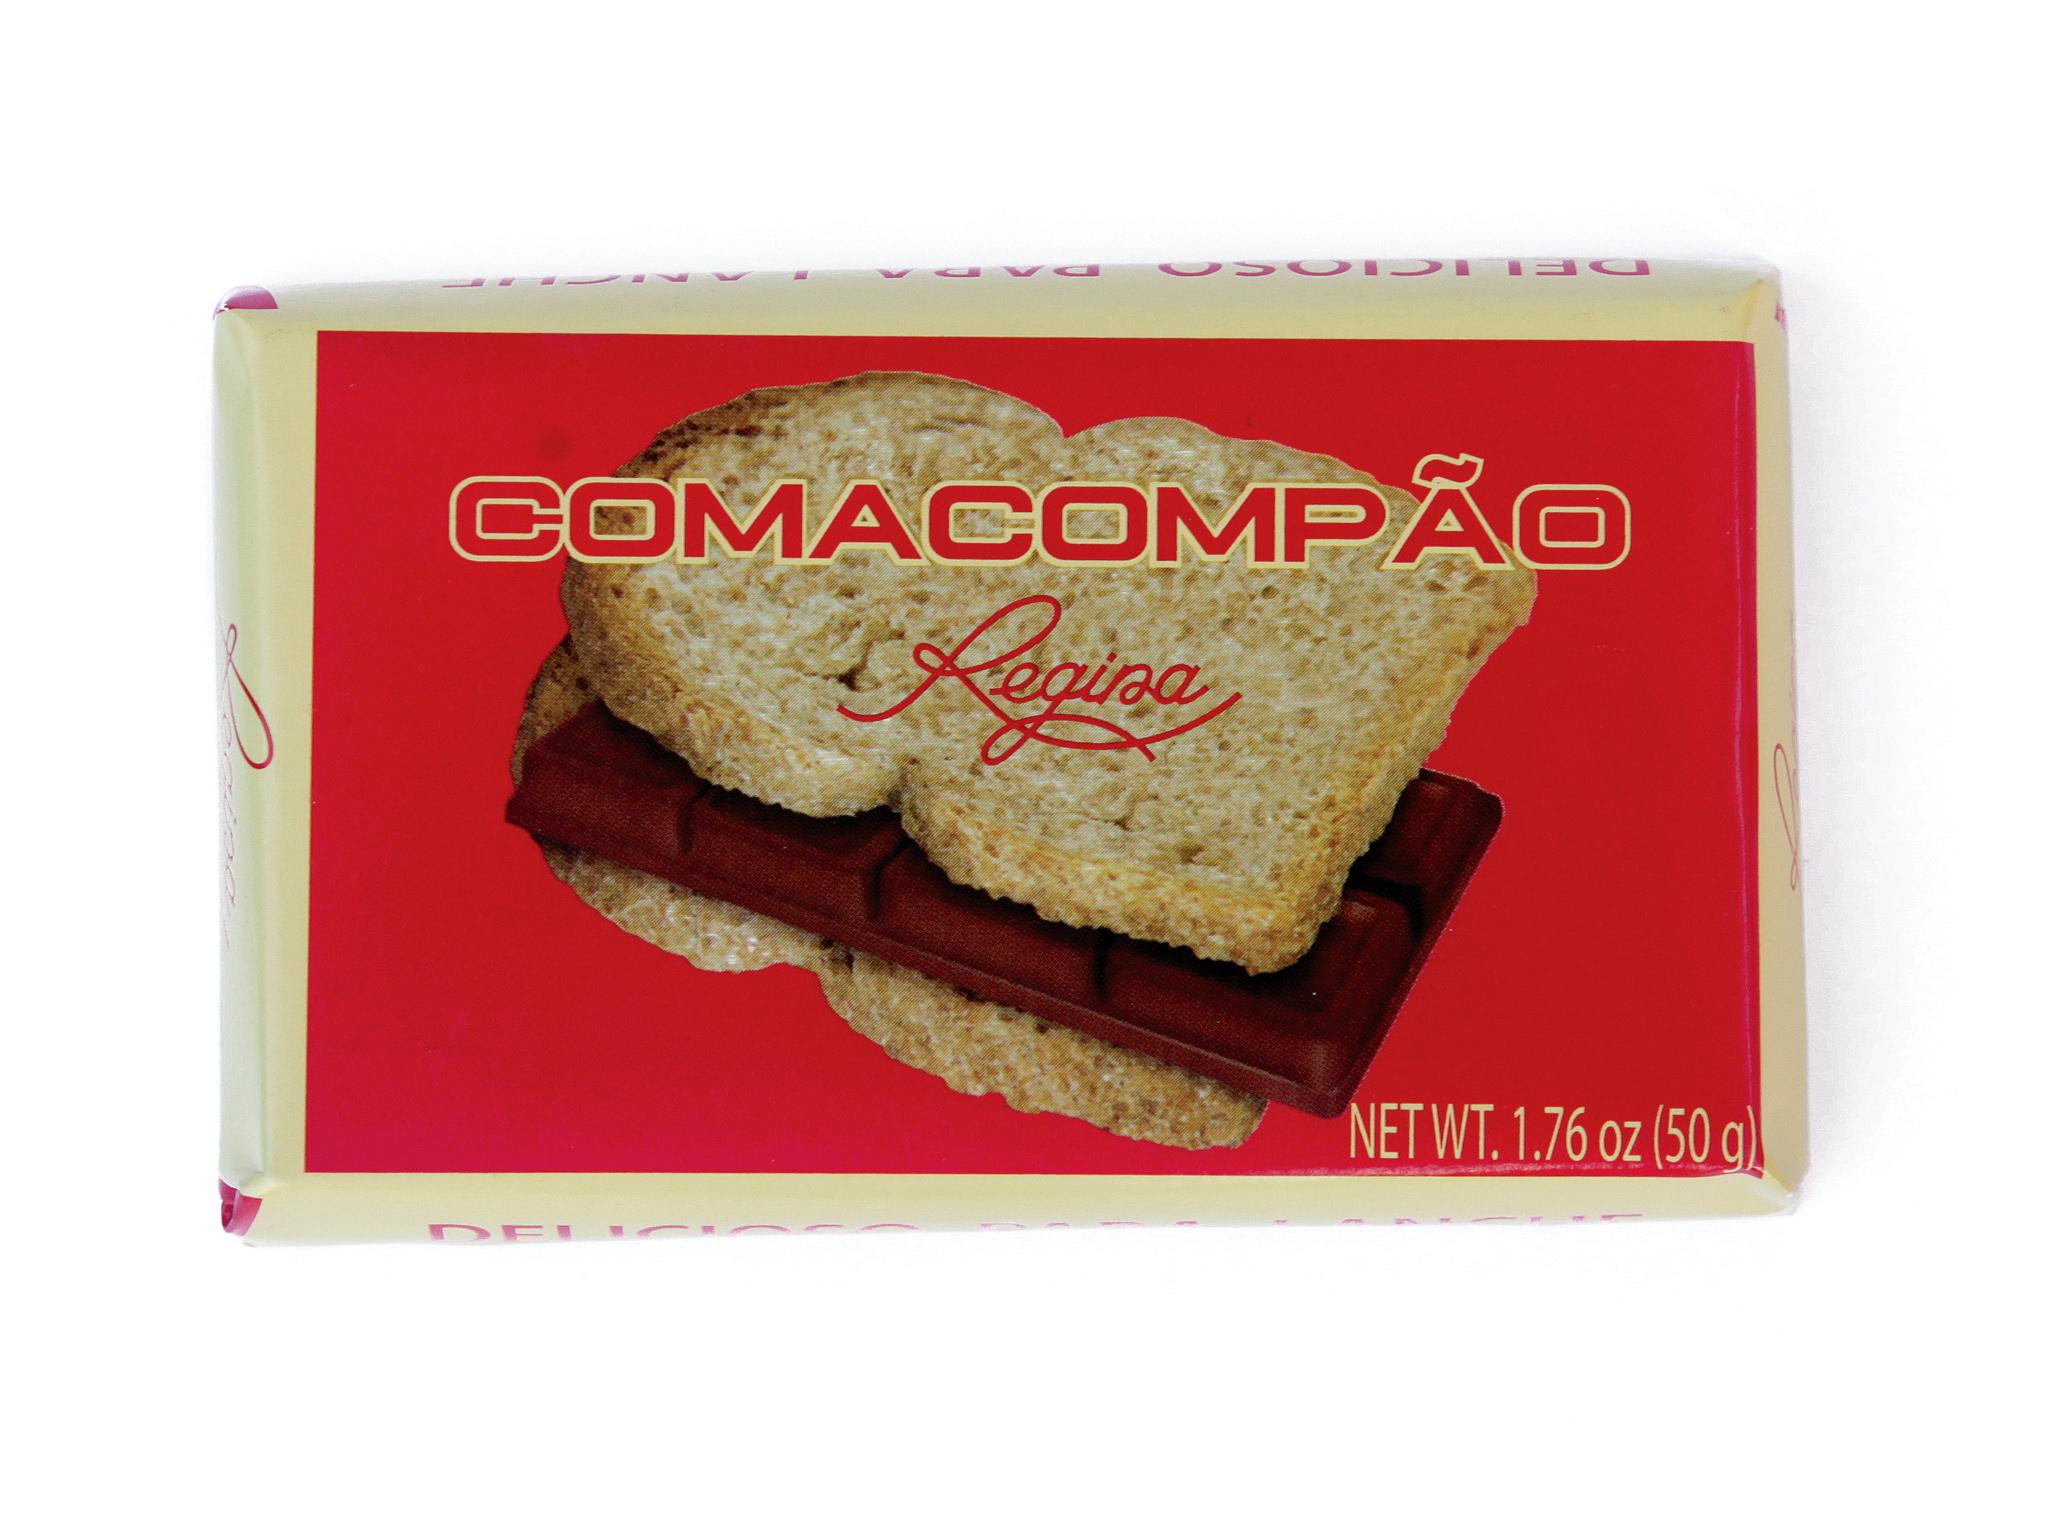 Chocolate Comacompao - Regina